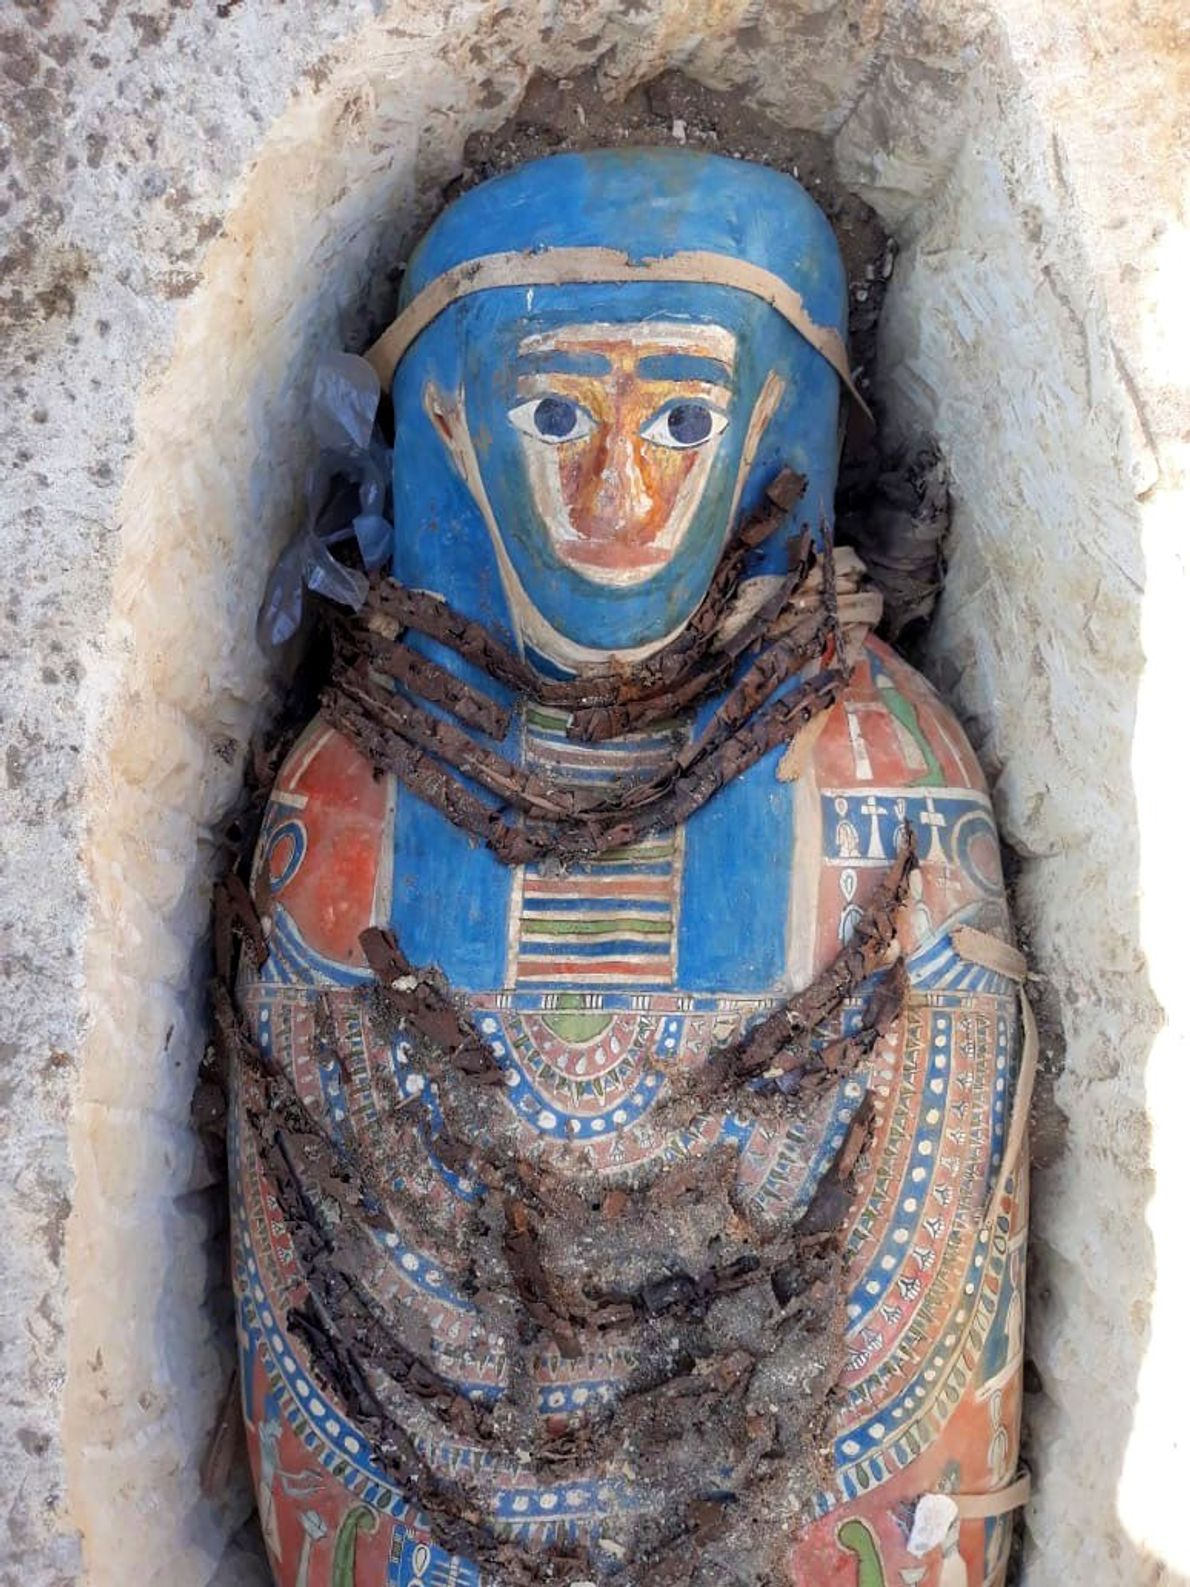 Ancient Egyptian mummies discovered near pyramid